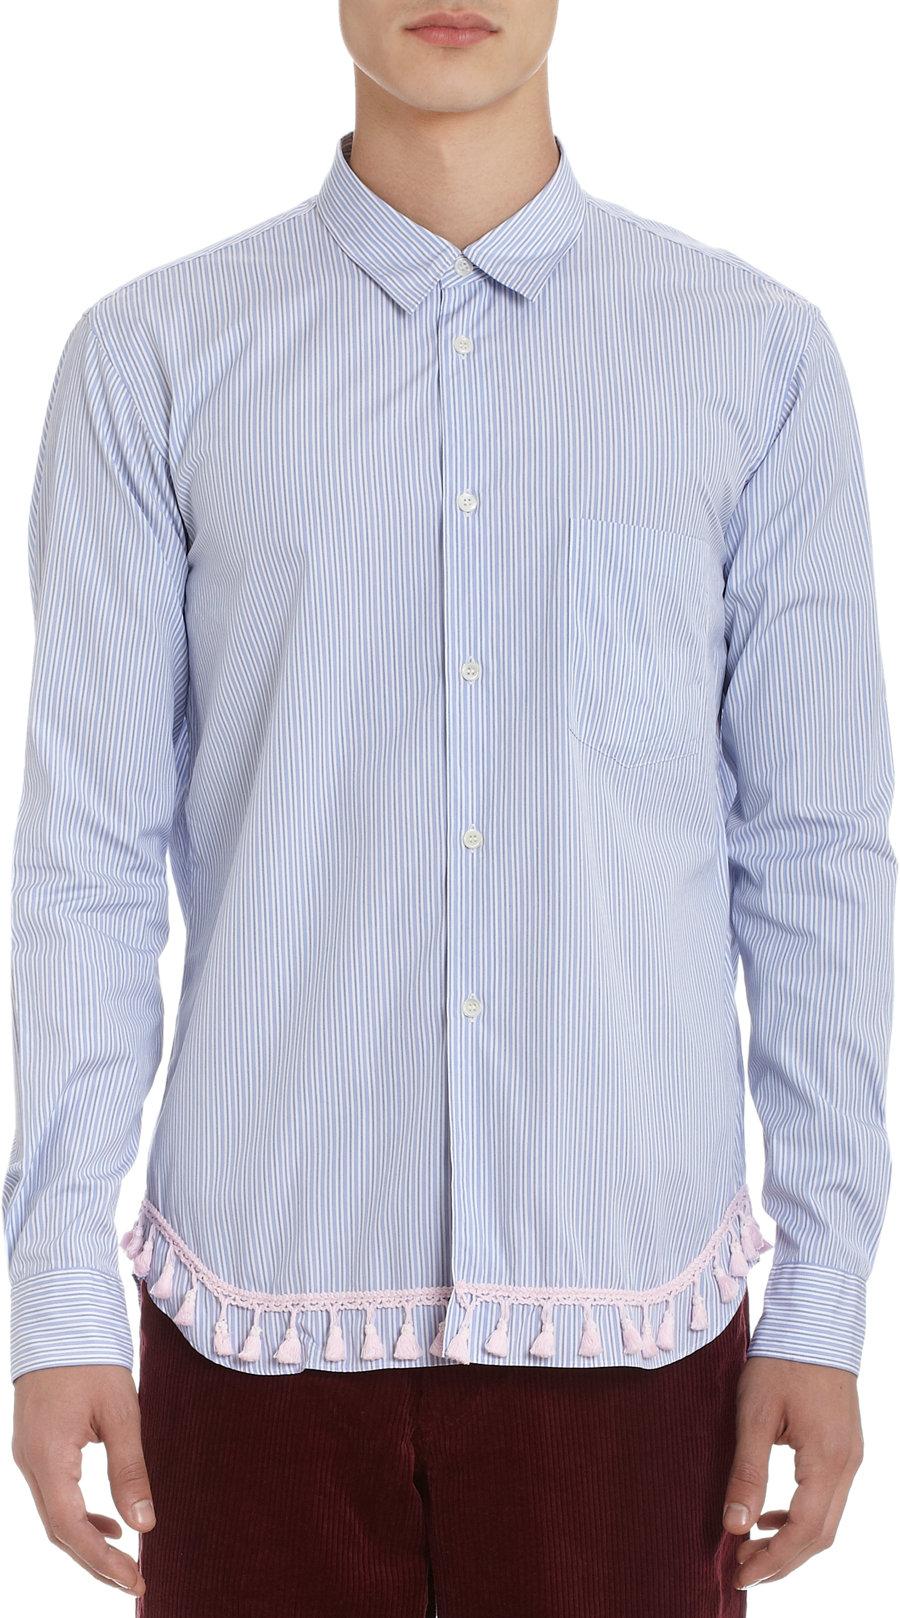 Comme des gar ons fringe bottom shirt in blue for men lyst for Mens shirt with tassels